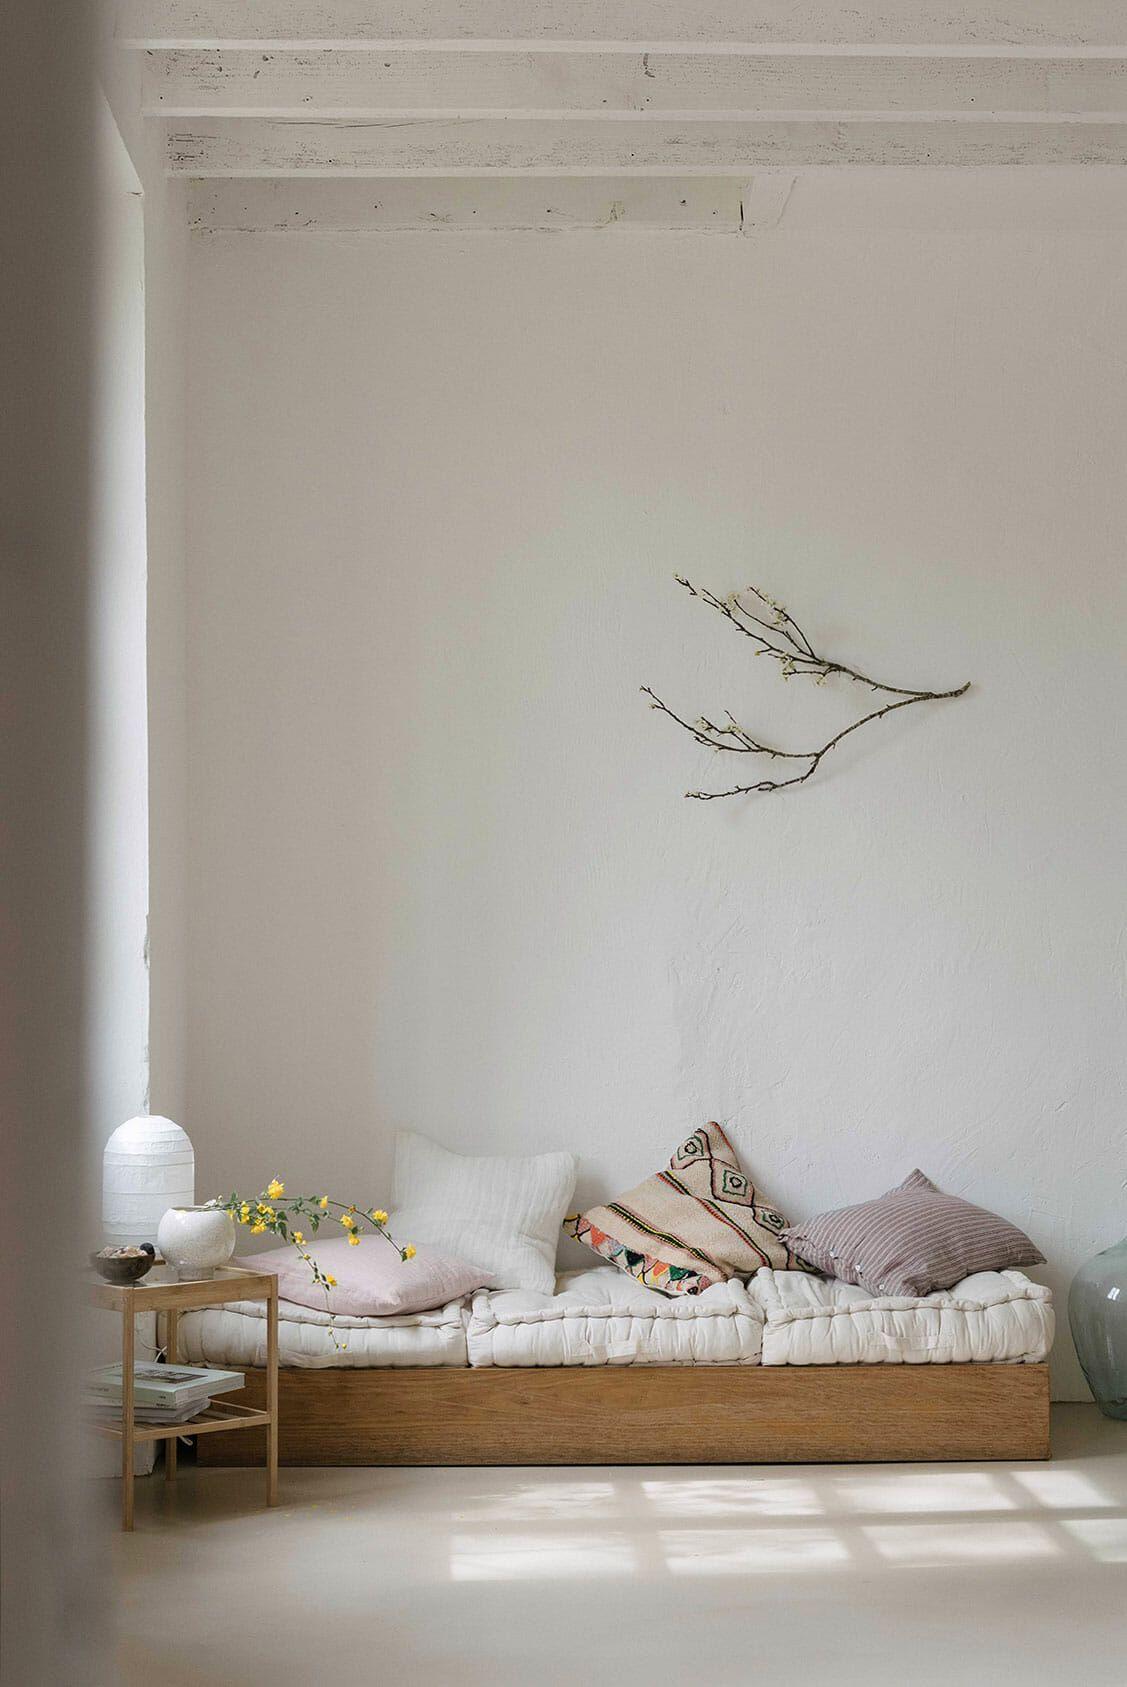 La jolie maison d'Olivia Thebaut - Lili in wonderland